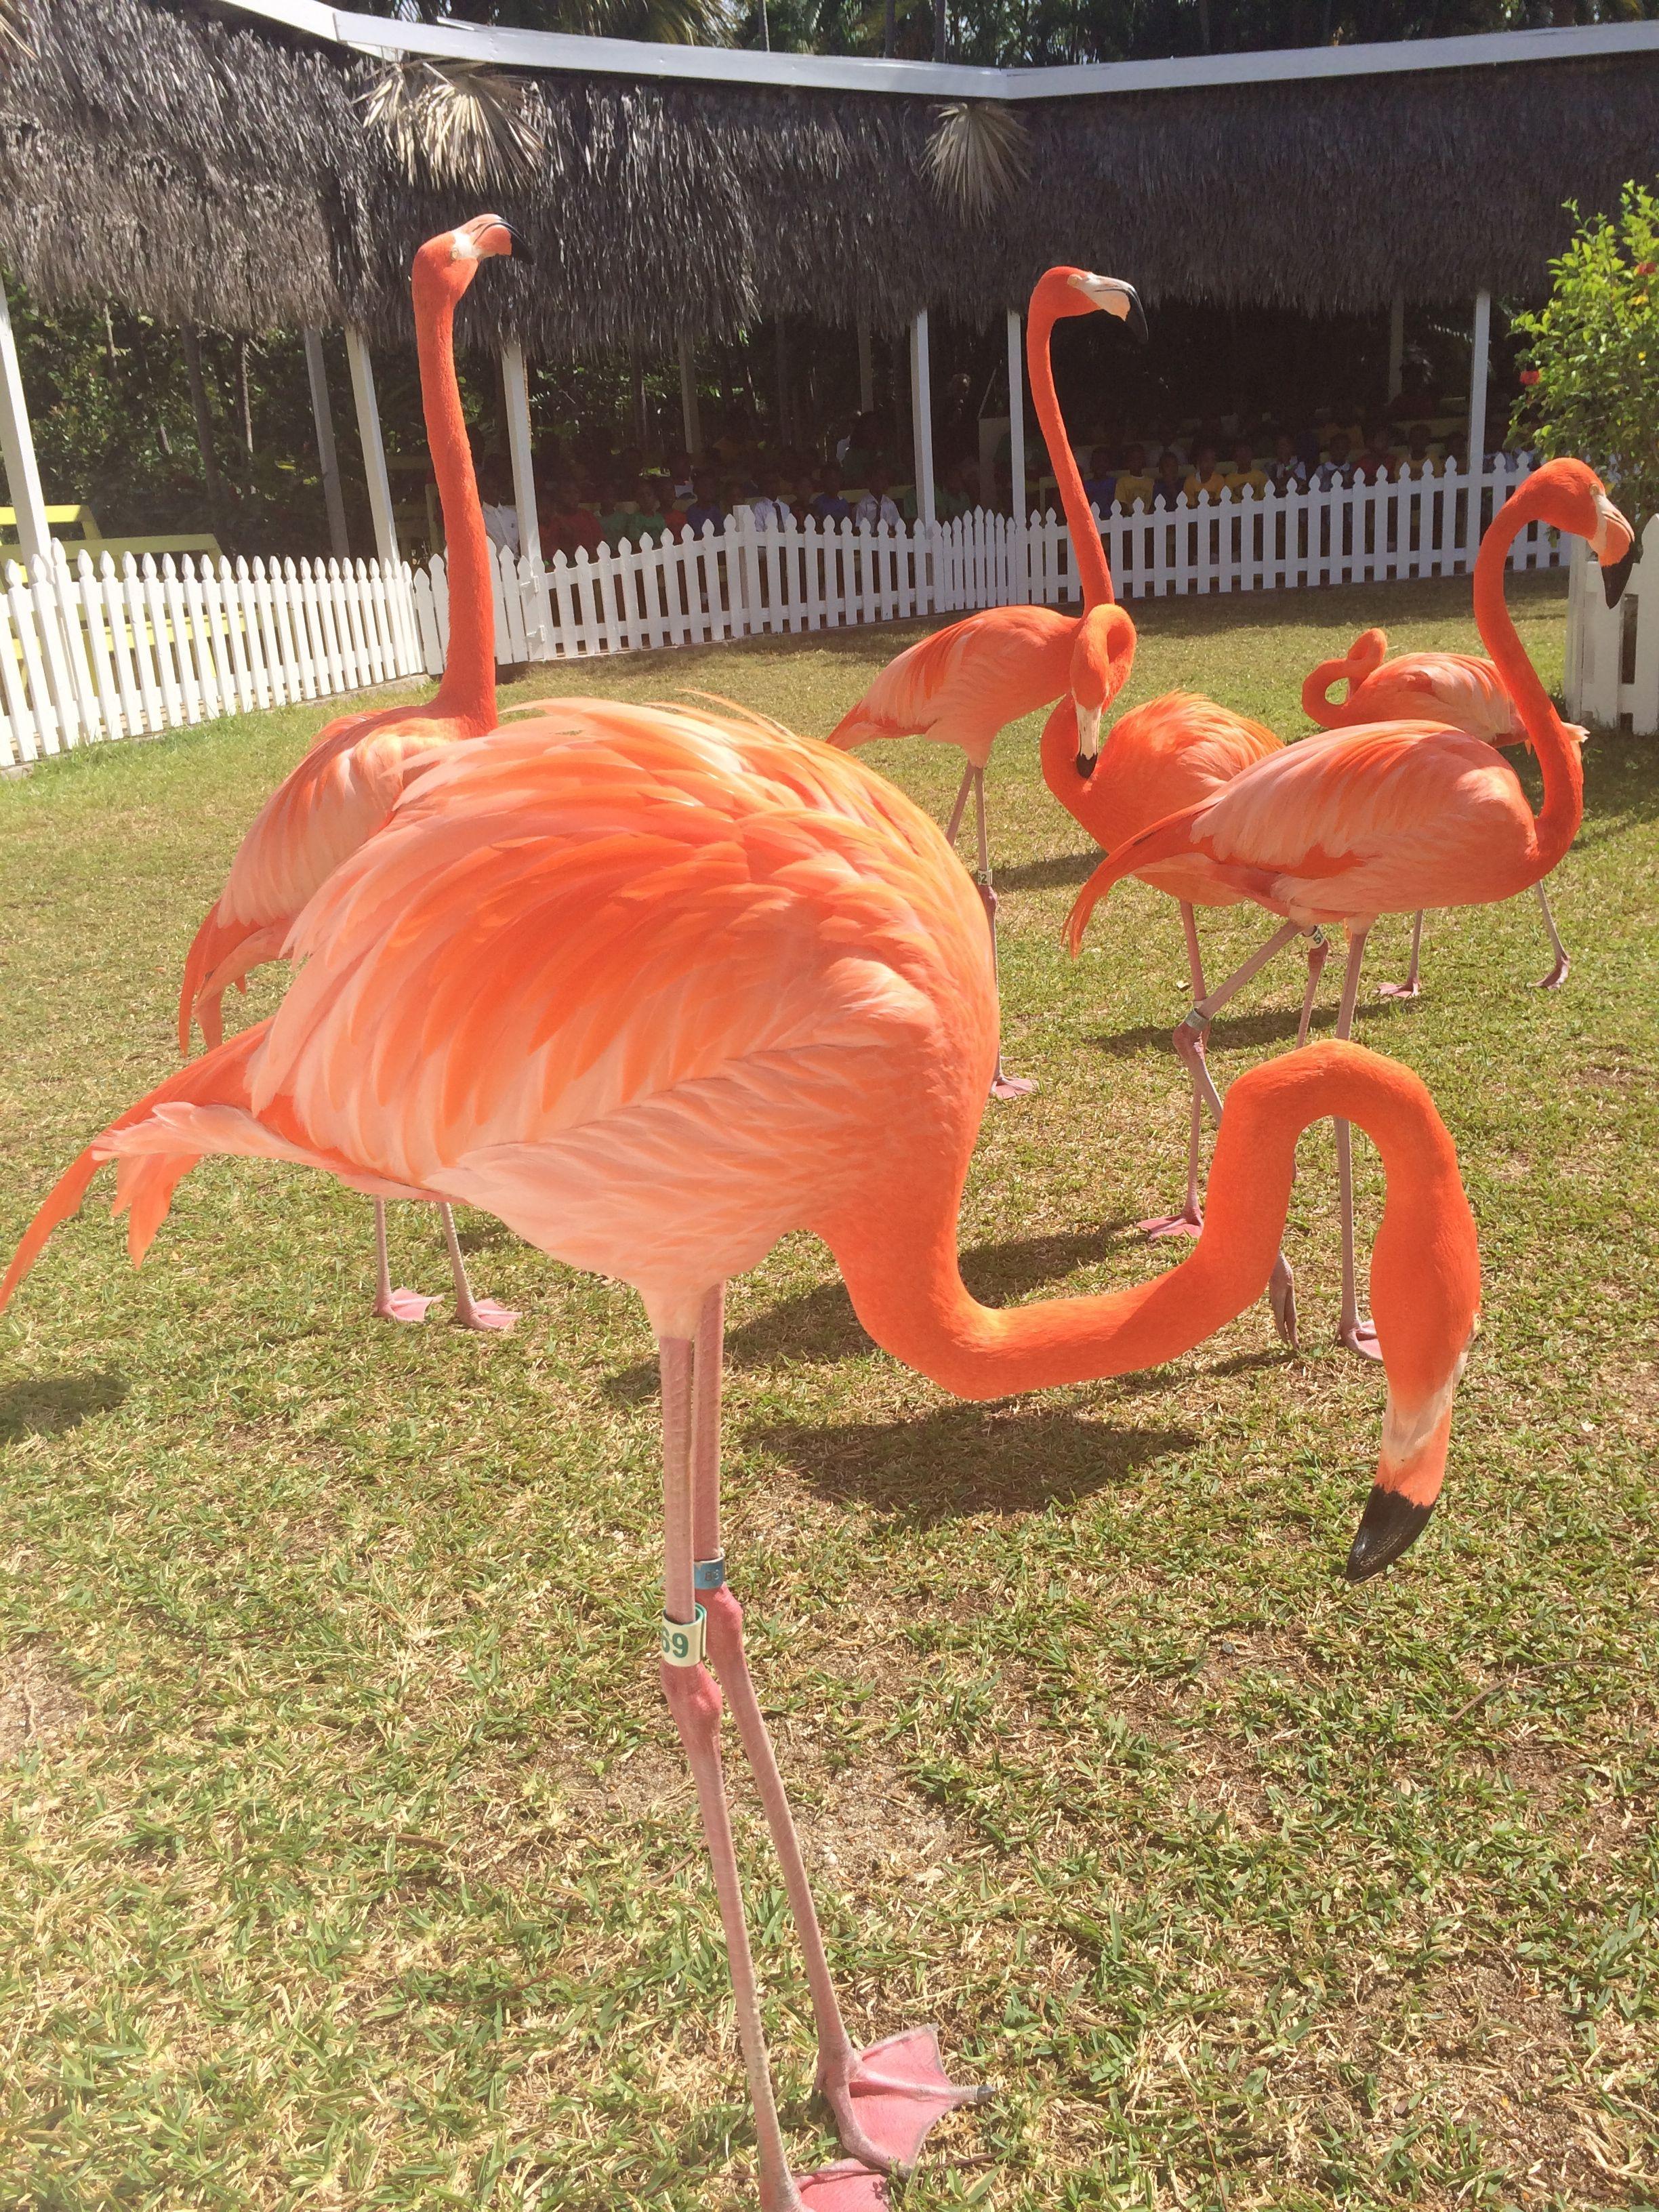 3eb94a8cfe384d0a589a9c2cffb6462b - Nassau Bahamas Ardastra Gardens And Zoo